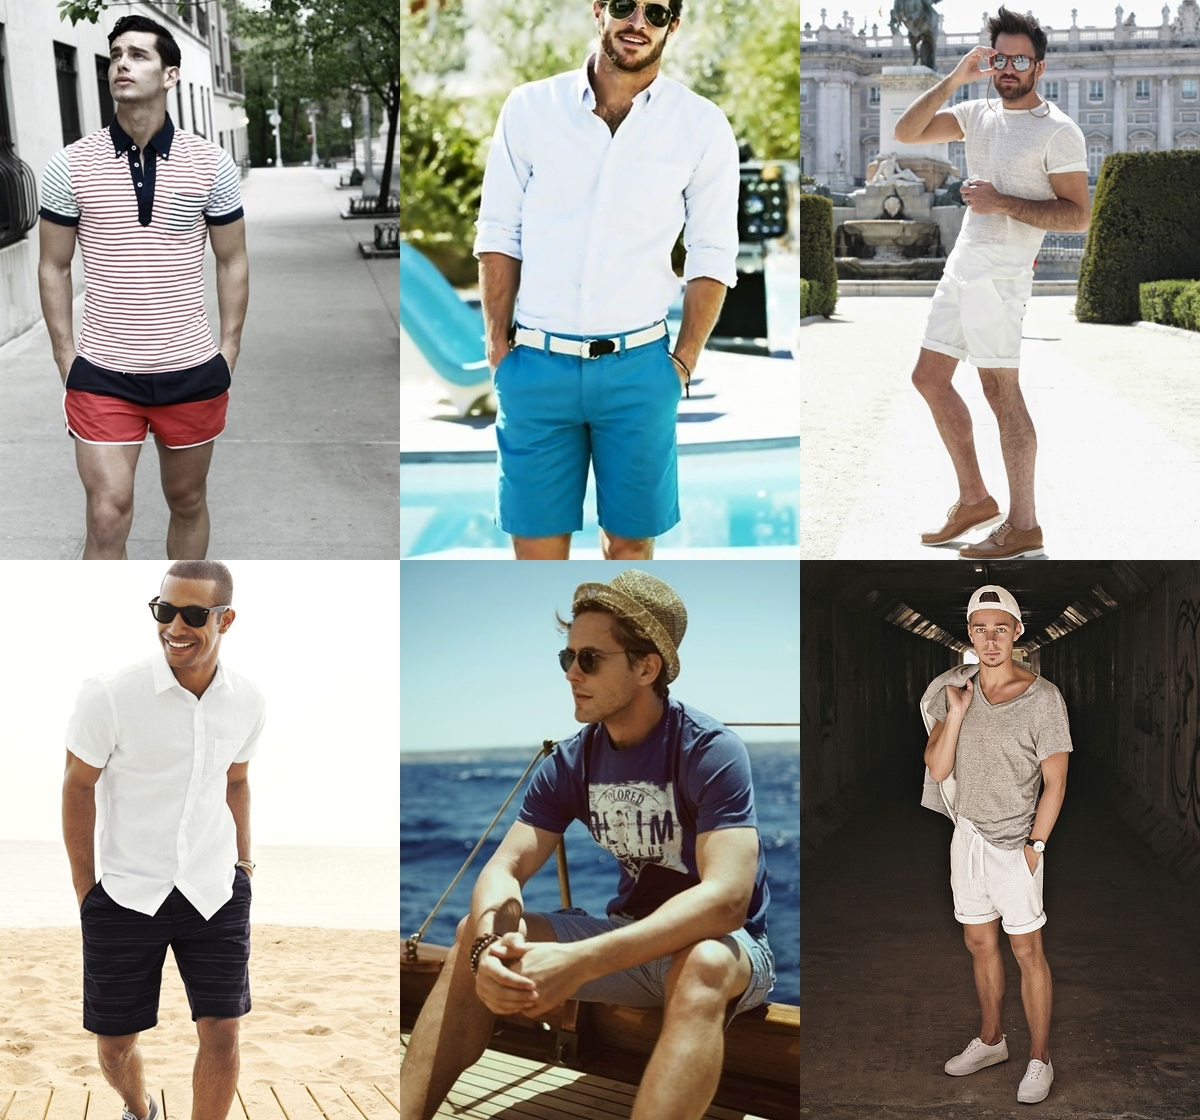 como usar short masculino, short masculino 2016, verão 2016, tendencia masculina, moda masculina, dicas de moda, dicas de estilo, alex cursino, moda sem censura, menswear, blogger, blogueiro de moda, 4